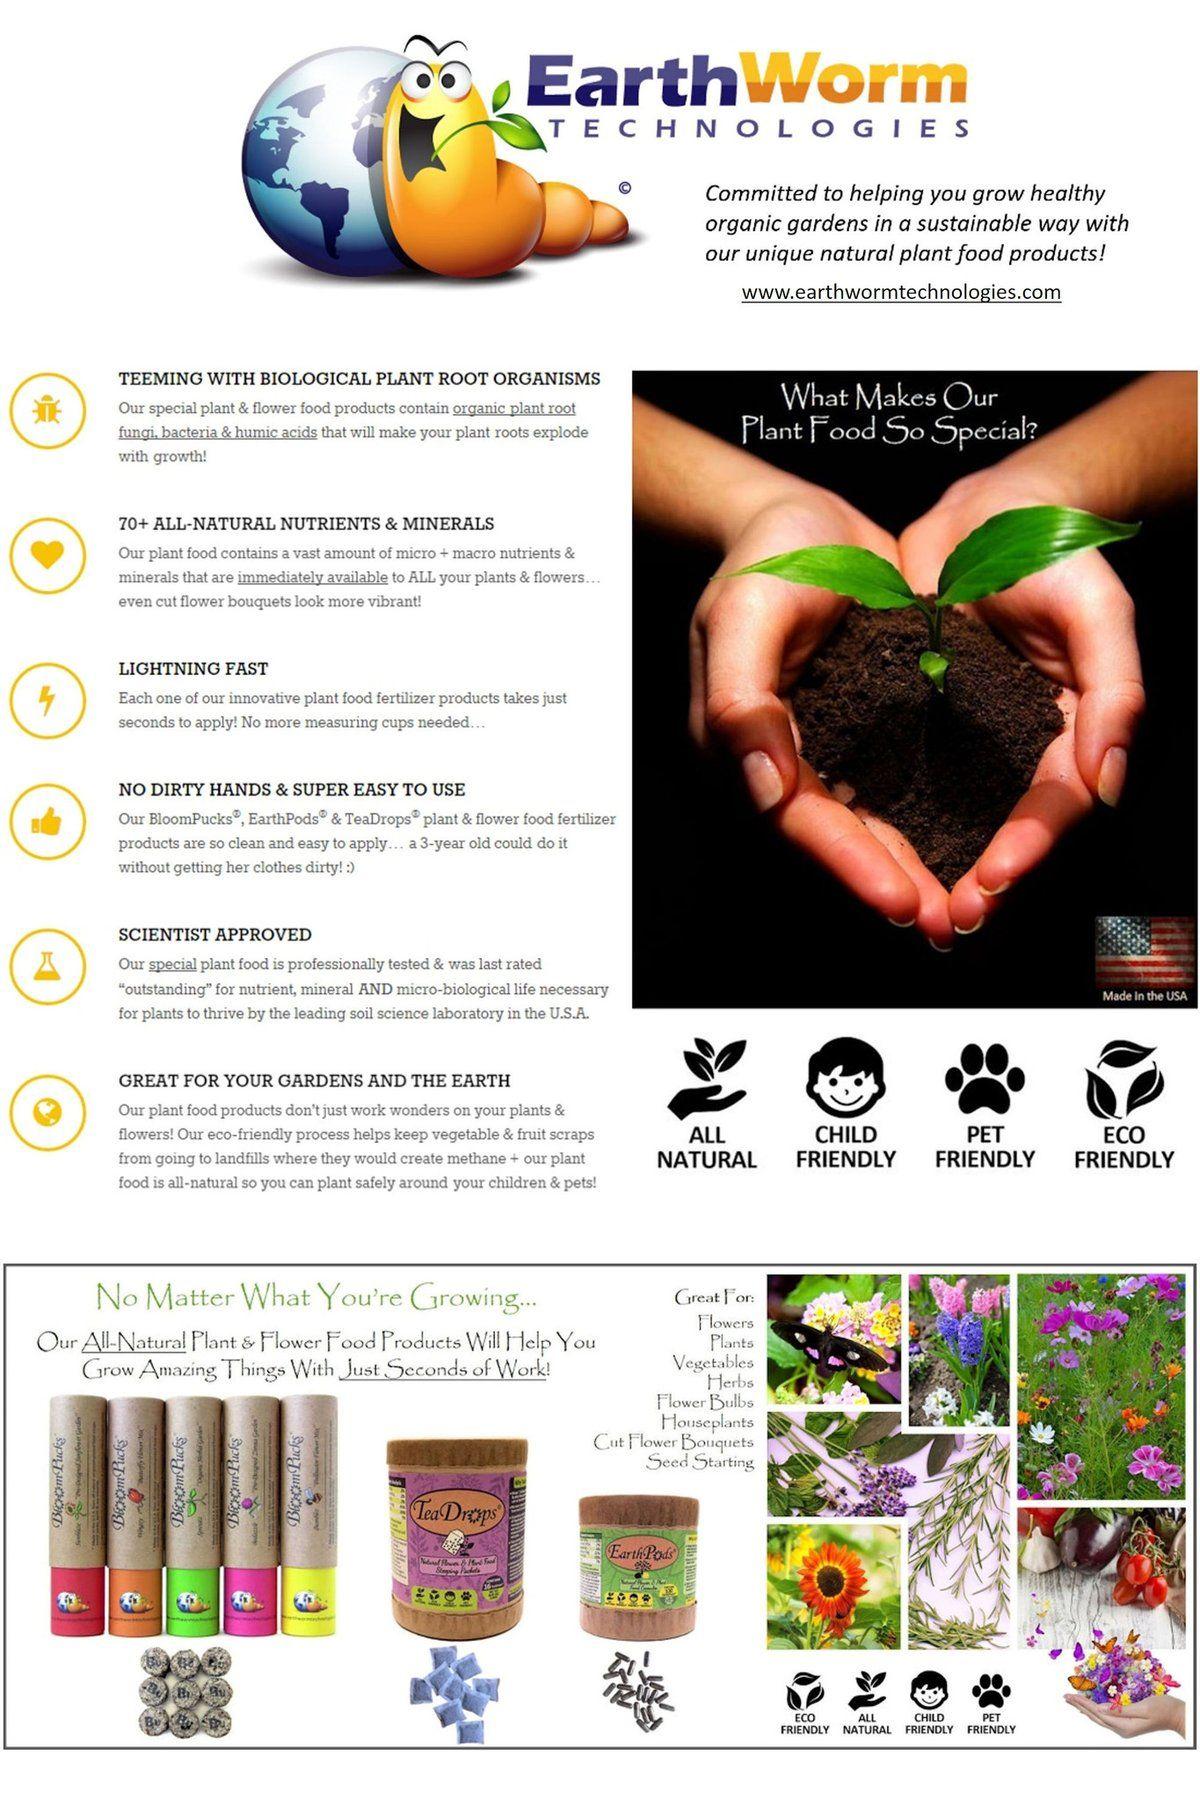 TeaDrops® Organic Plant Food & Flower Liquid Fertilizer